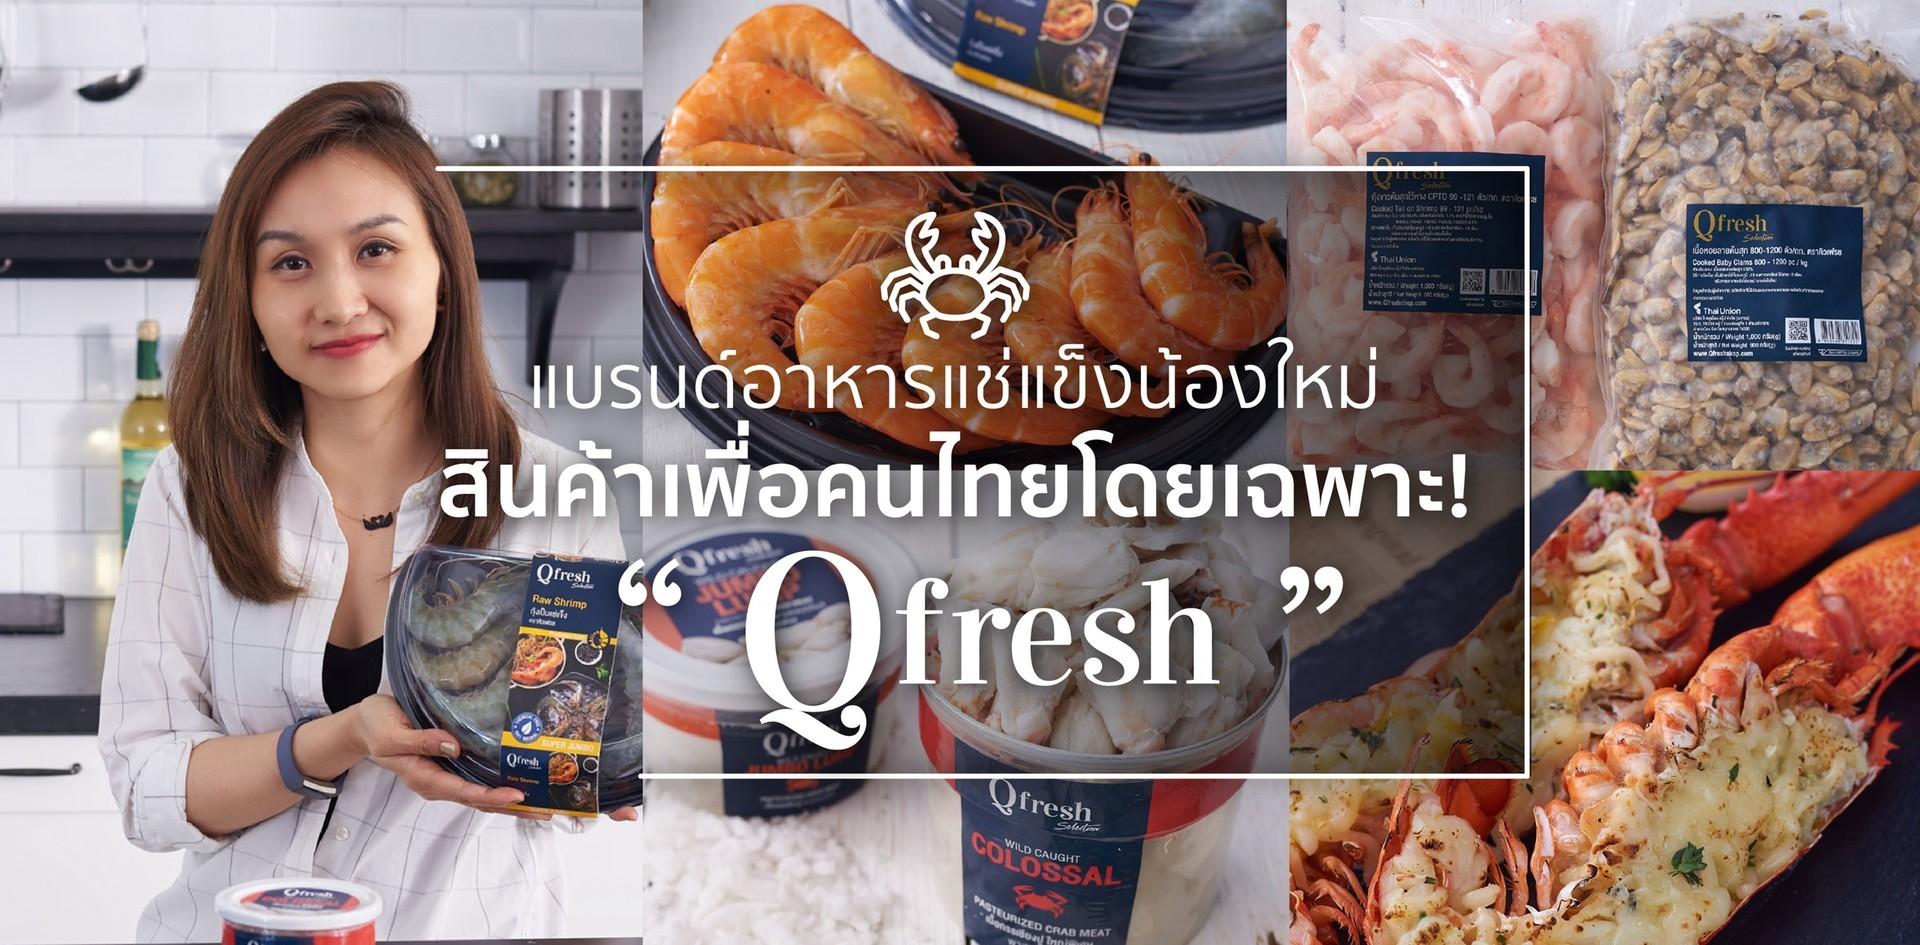 """Qfresh"" แบรนด์อาหารแช่แข็งน้องใหม่ เสิร์ฟความสดเพื่อคนไทยโดยเฉพาะ!"